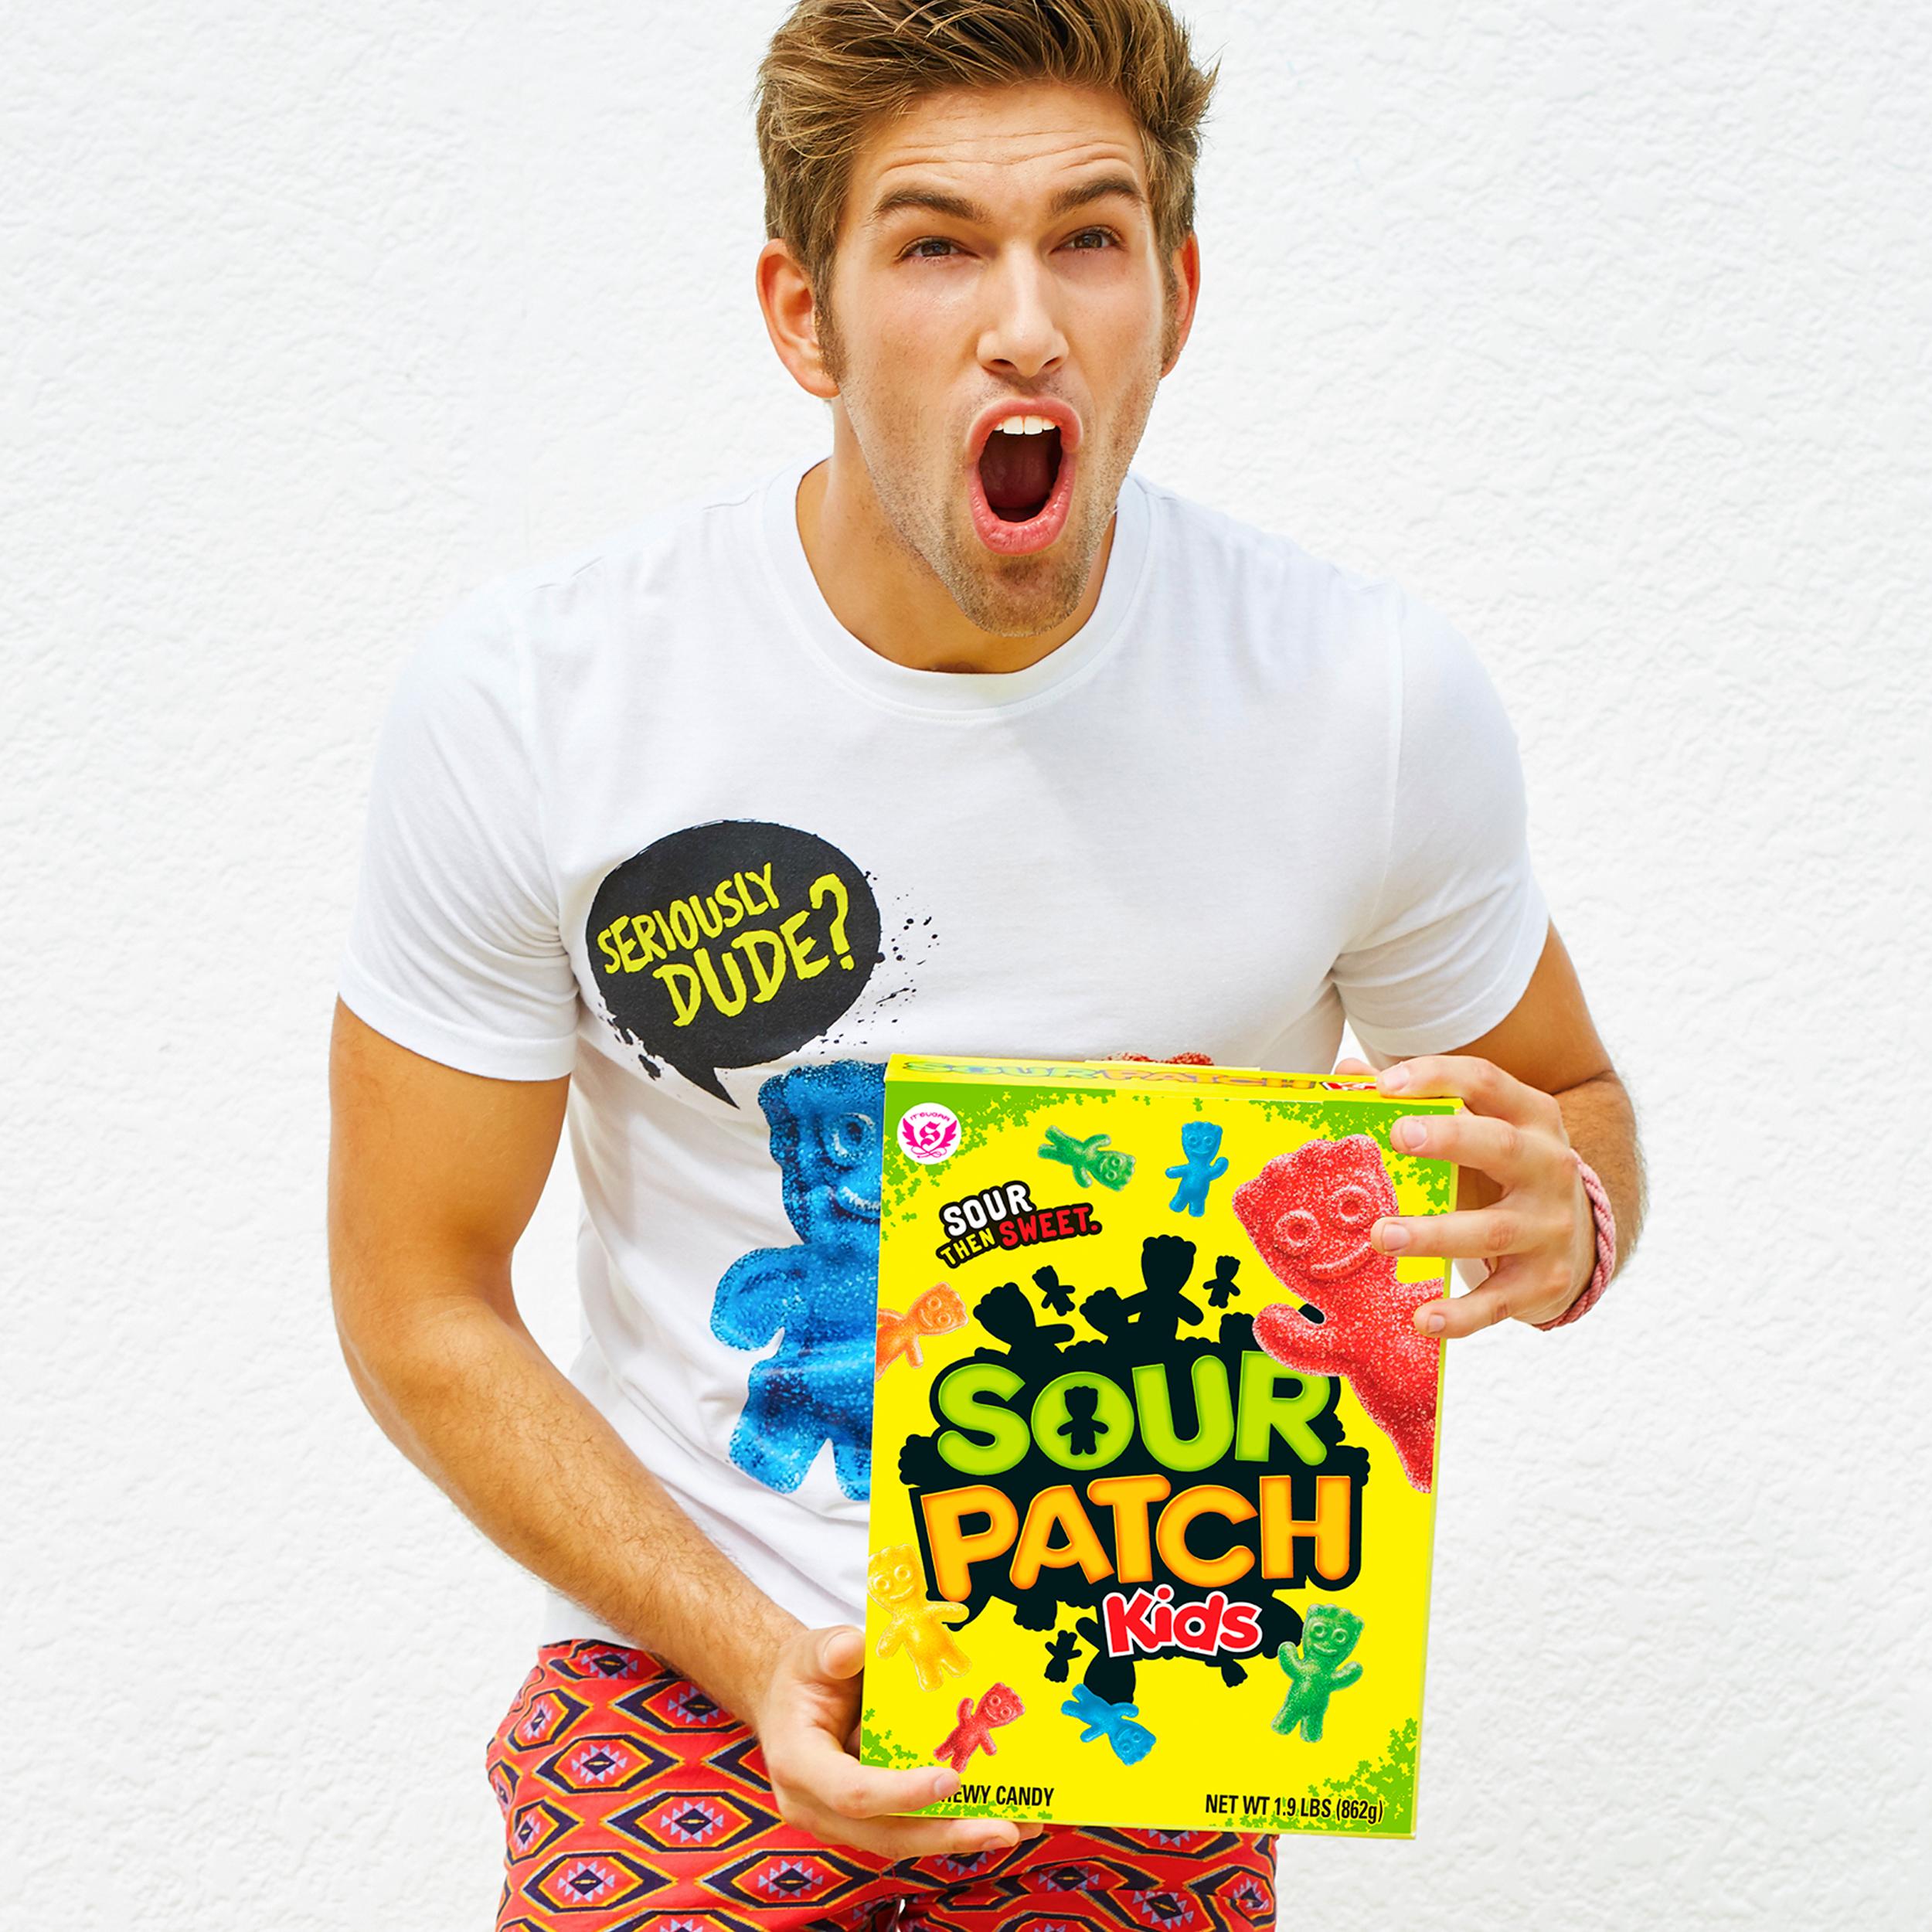 World S Largest Box Of Sour Patch Kids Sour Patch Kids Sour Patch Sour Patch Kids Gift